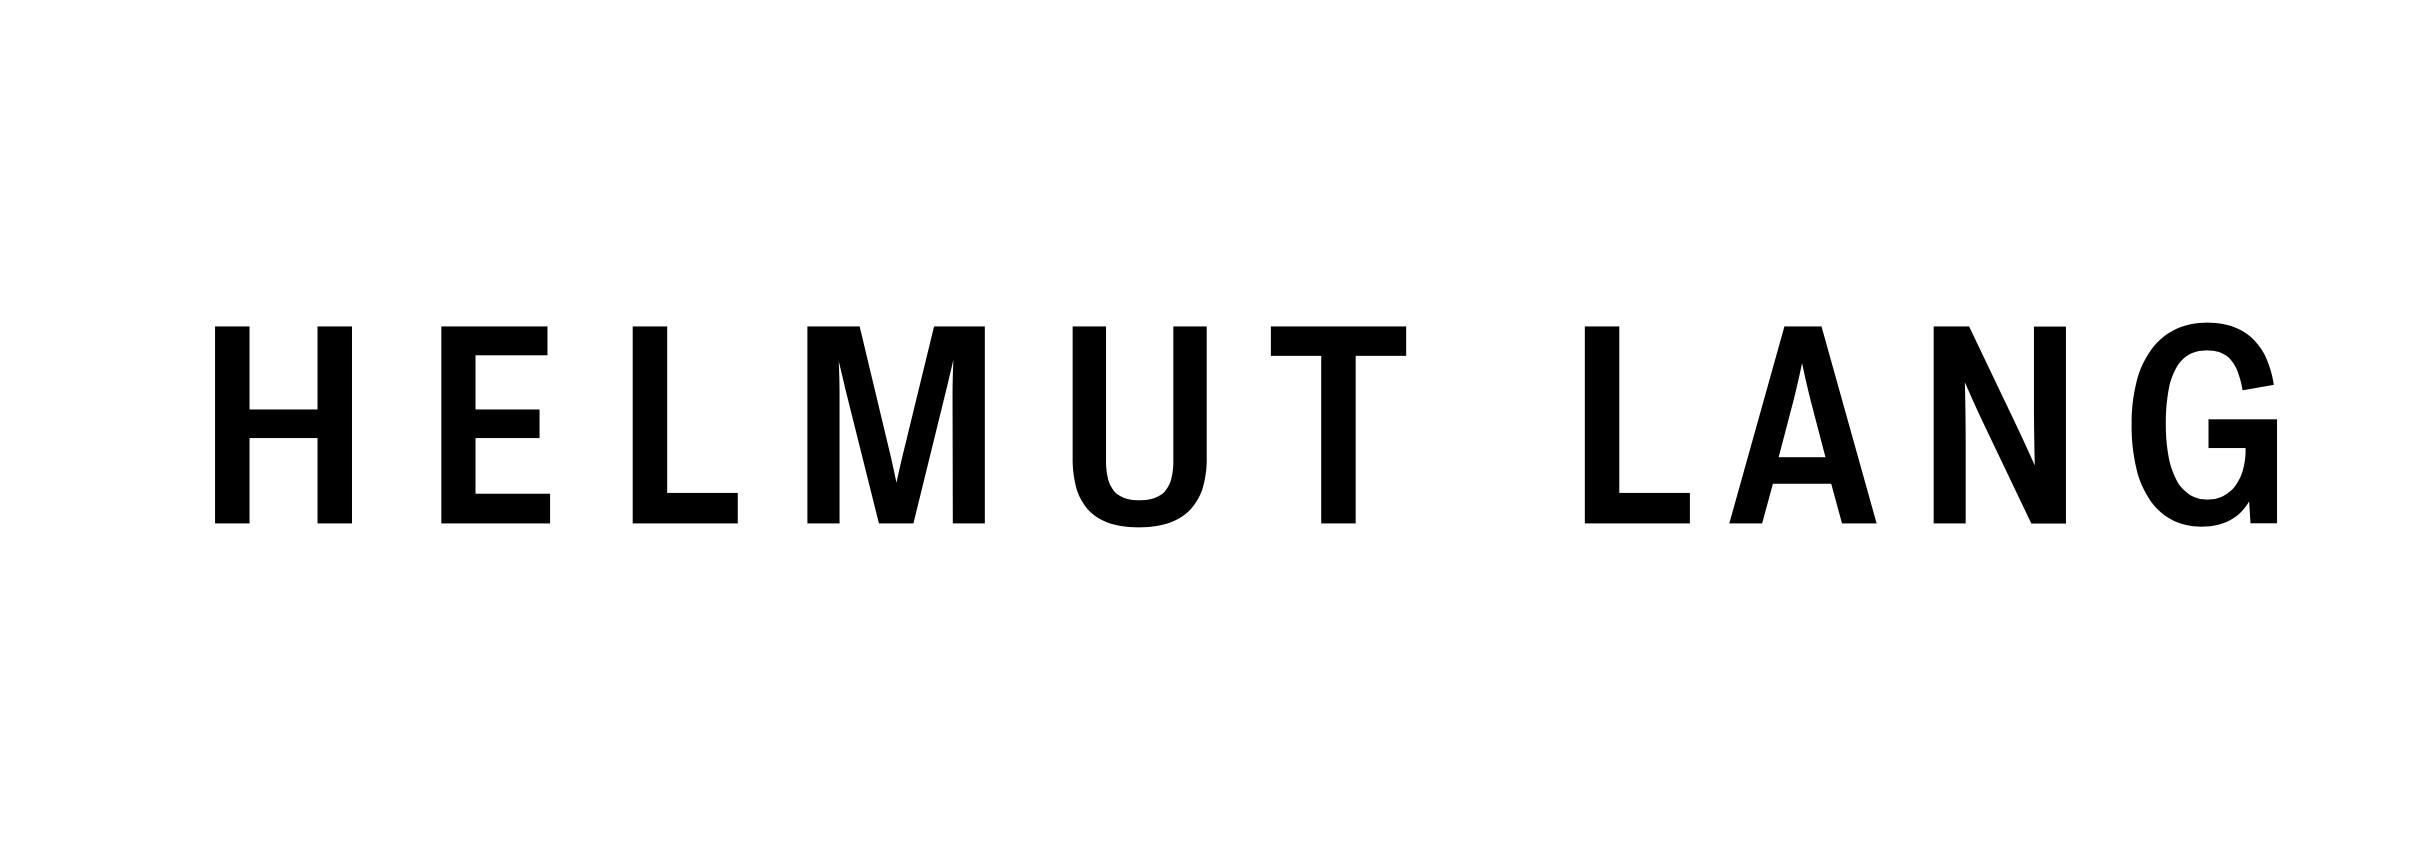 Helmut Lang Logo